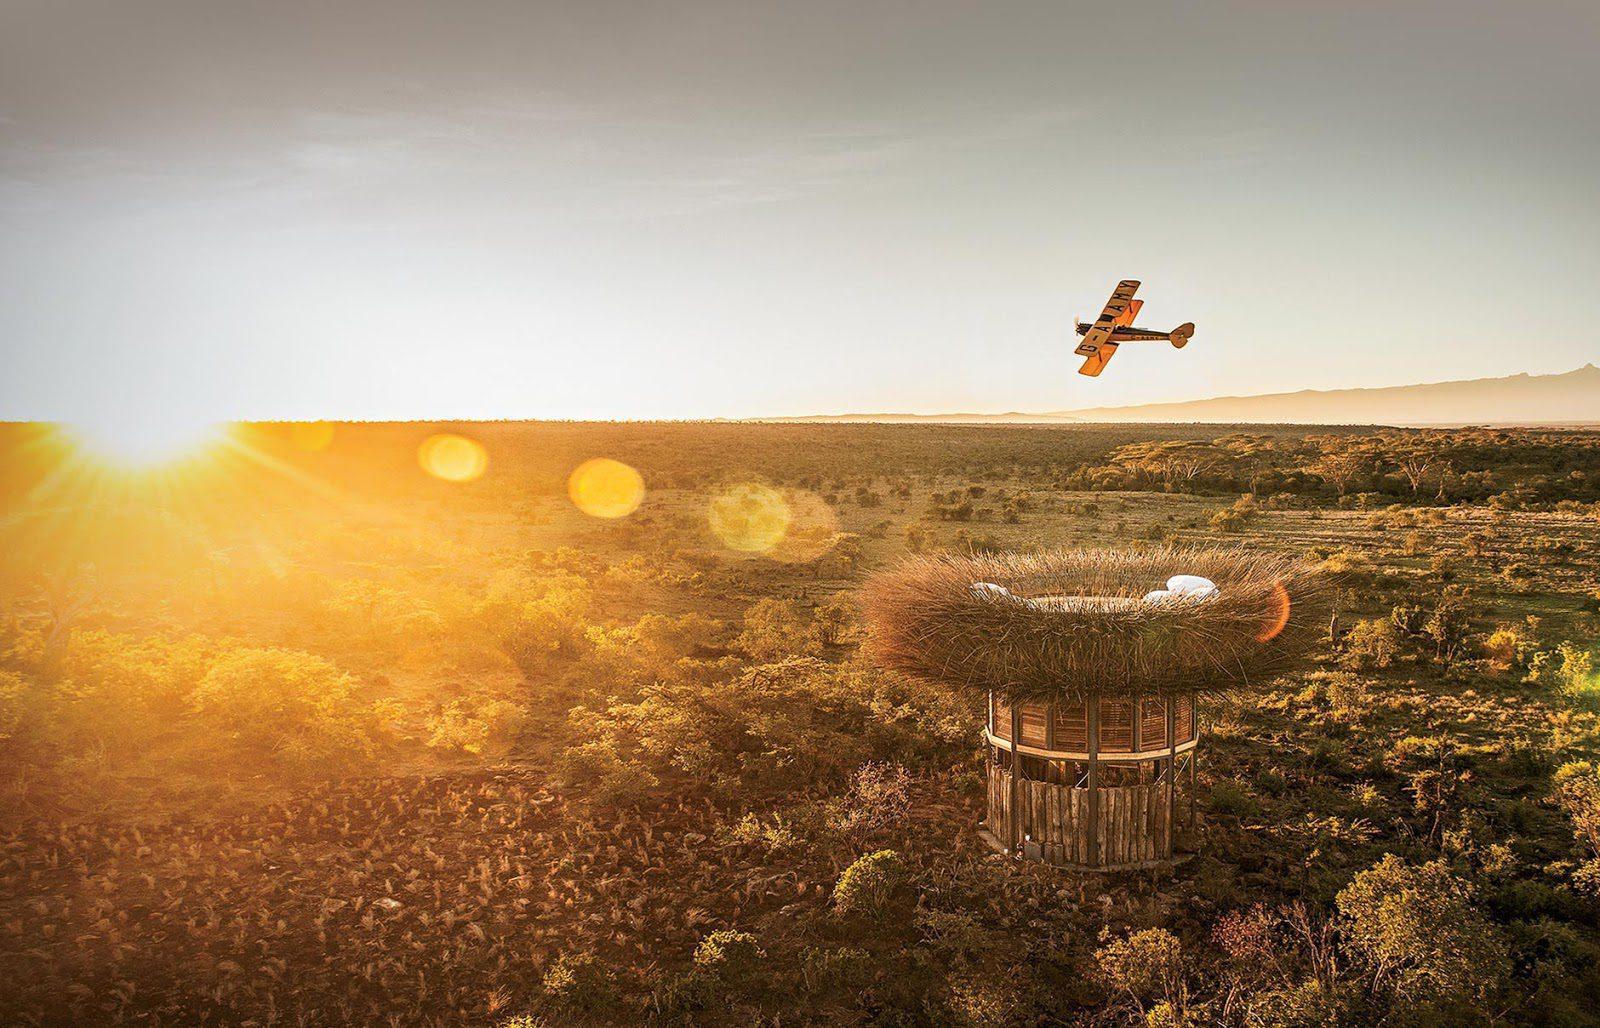 segera's nest on biplane safari flying overhead at sunset